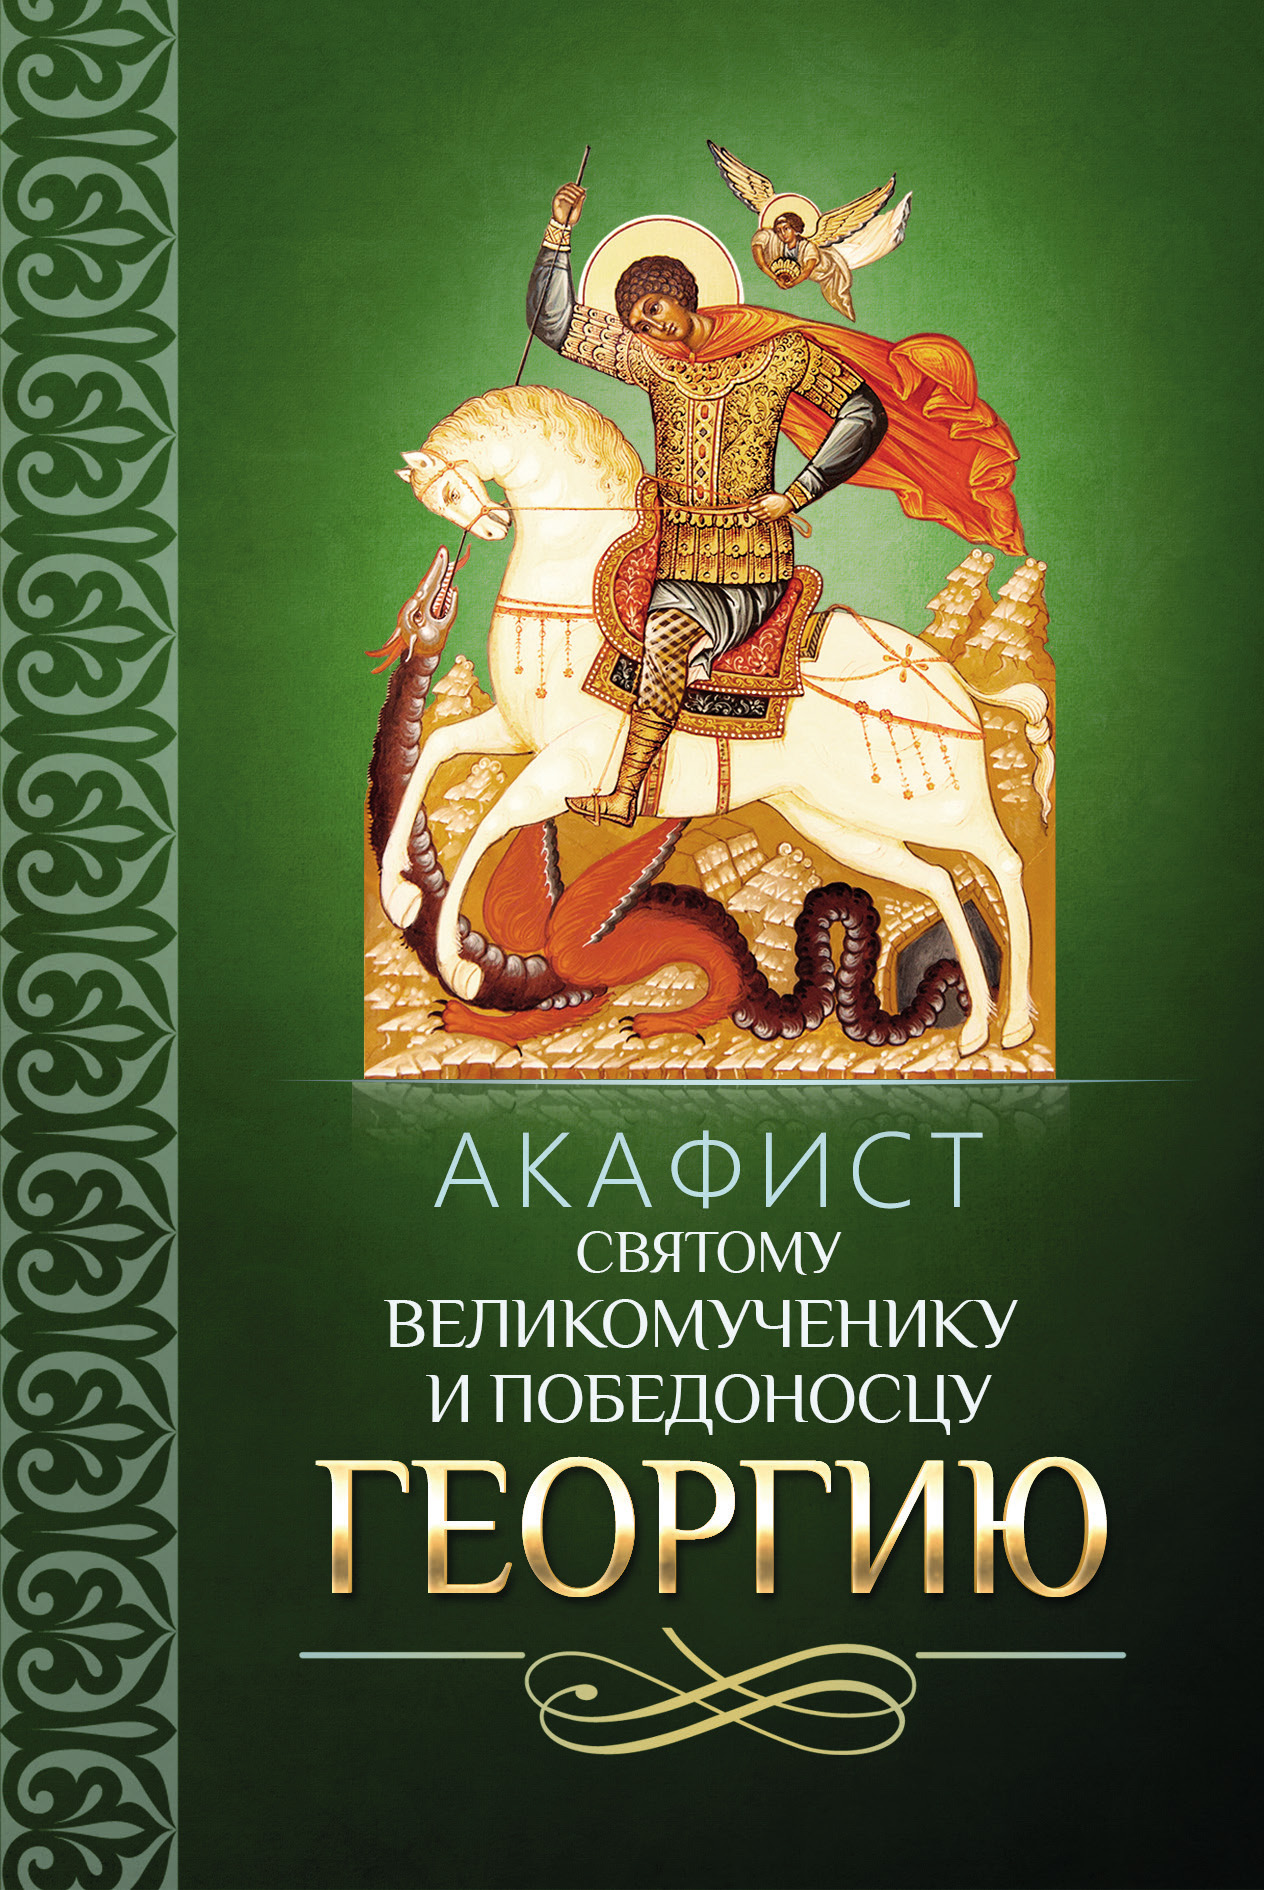 Сборник Акафист святому великомученику и Победоносцу Георгию